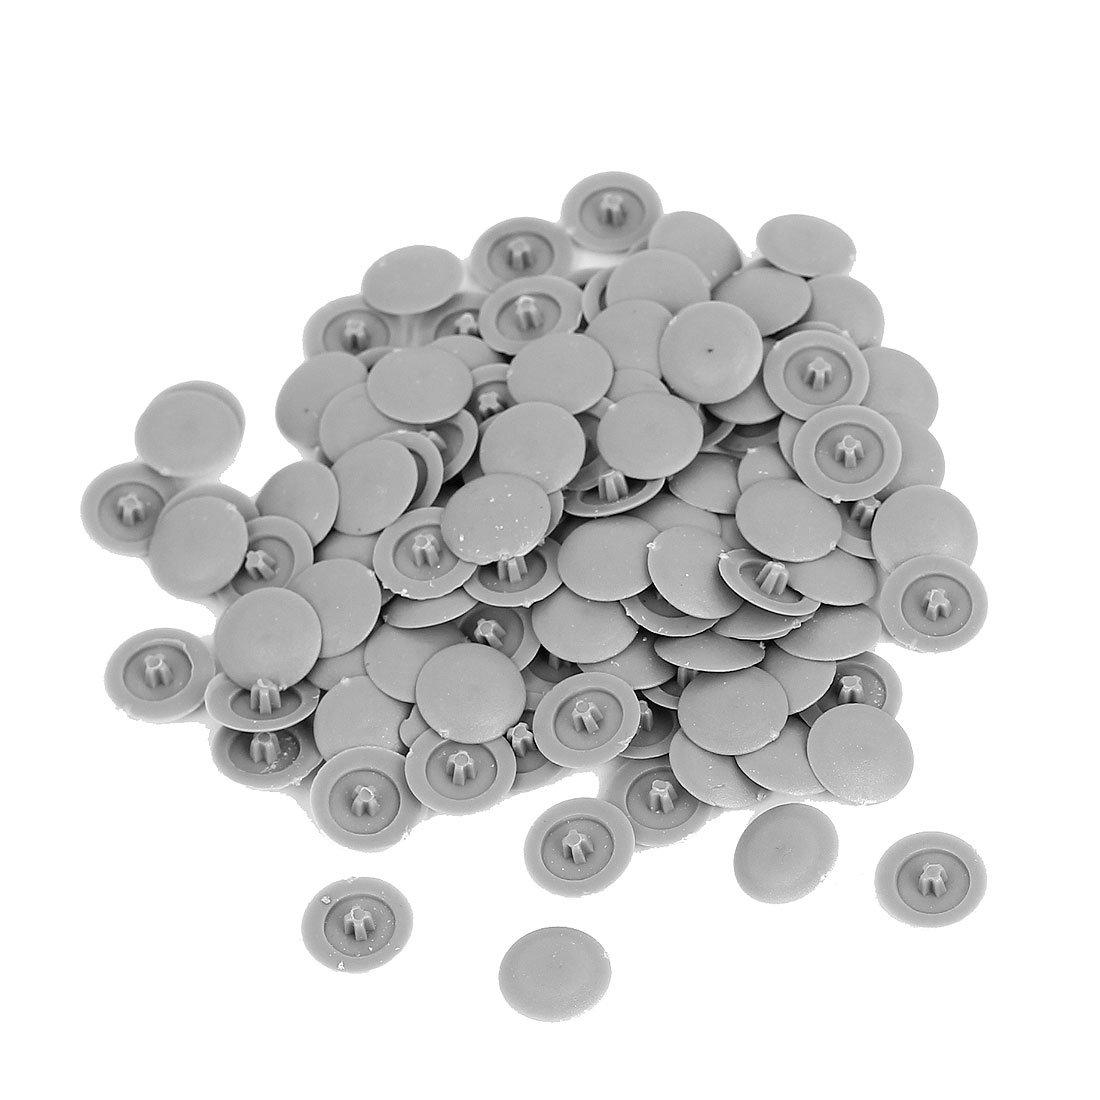 Phillips Screws Plastic Decoration Cap Cover 12mm x 3mm 100pcs Gray uxcell a15072800ux0736